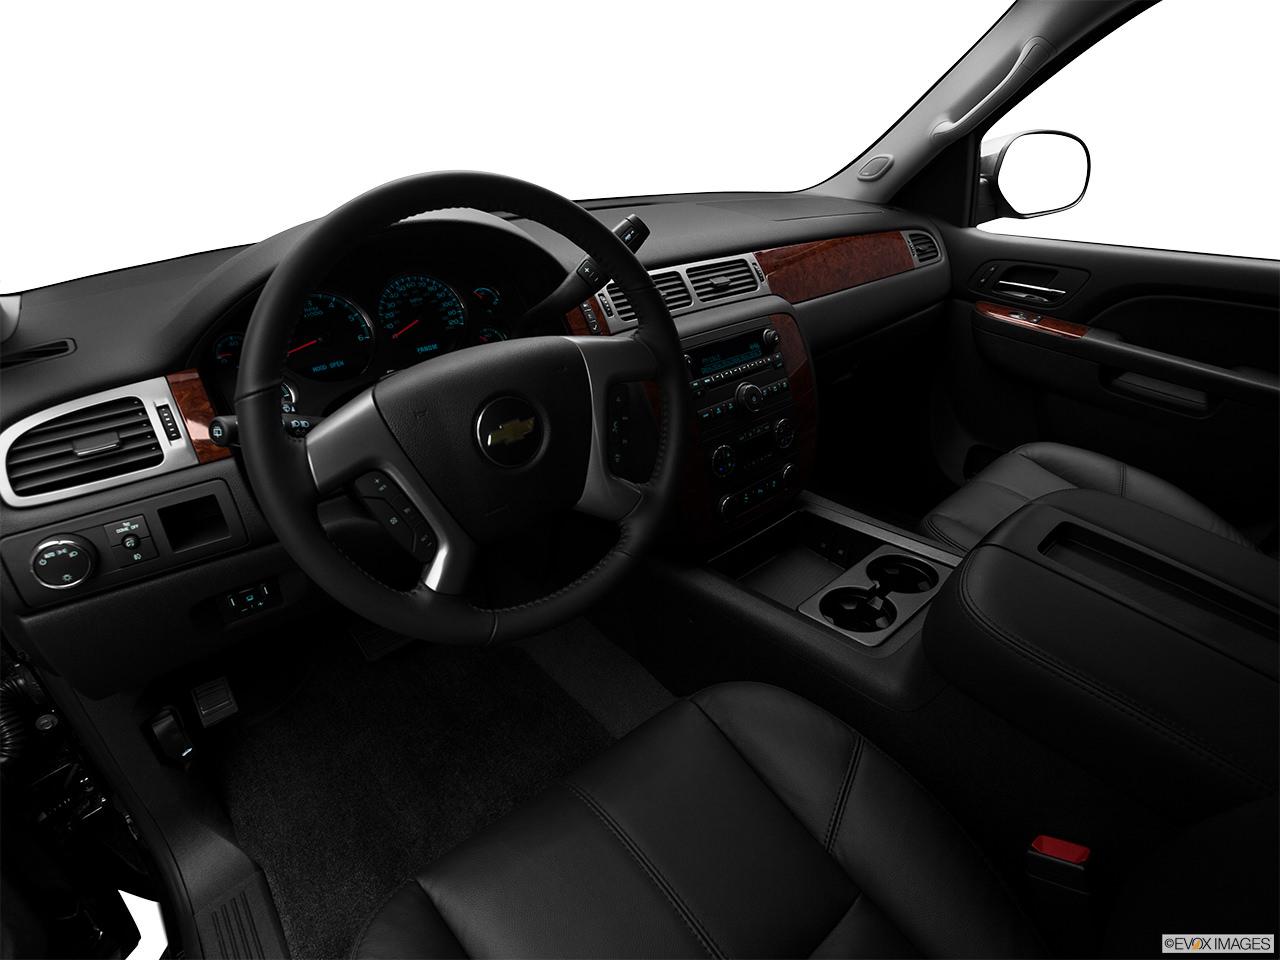 Chevrolet Suburban 2012 Interior